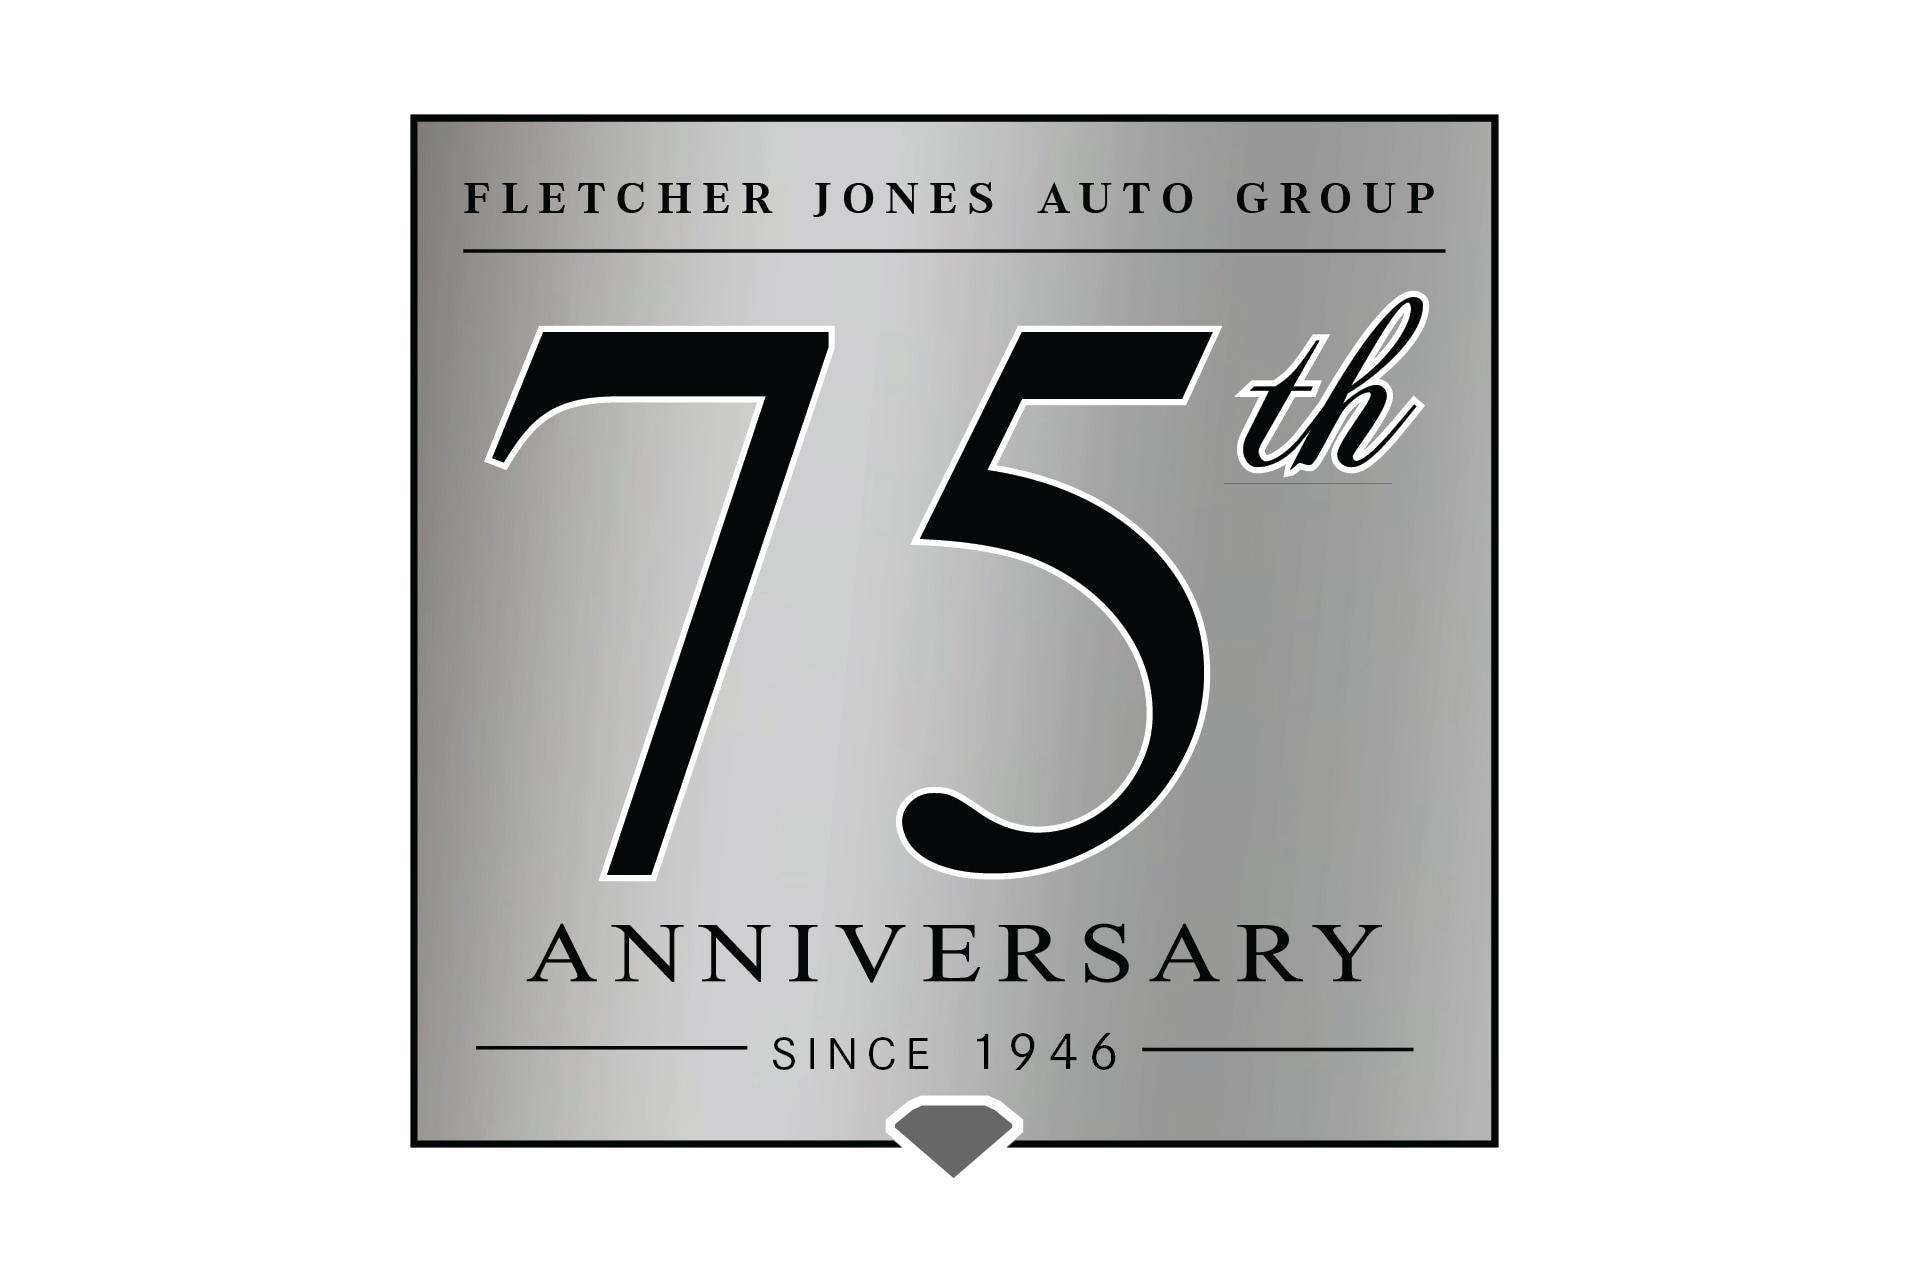 1920 × 1280